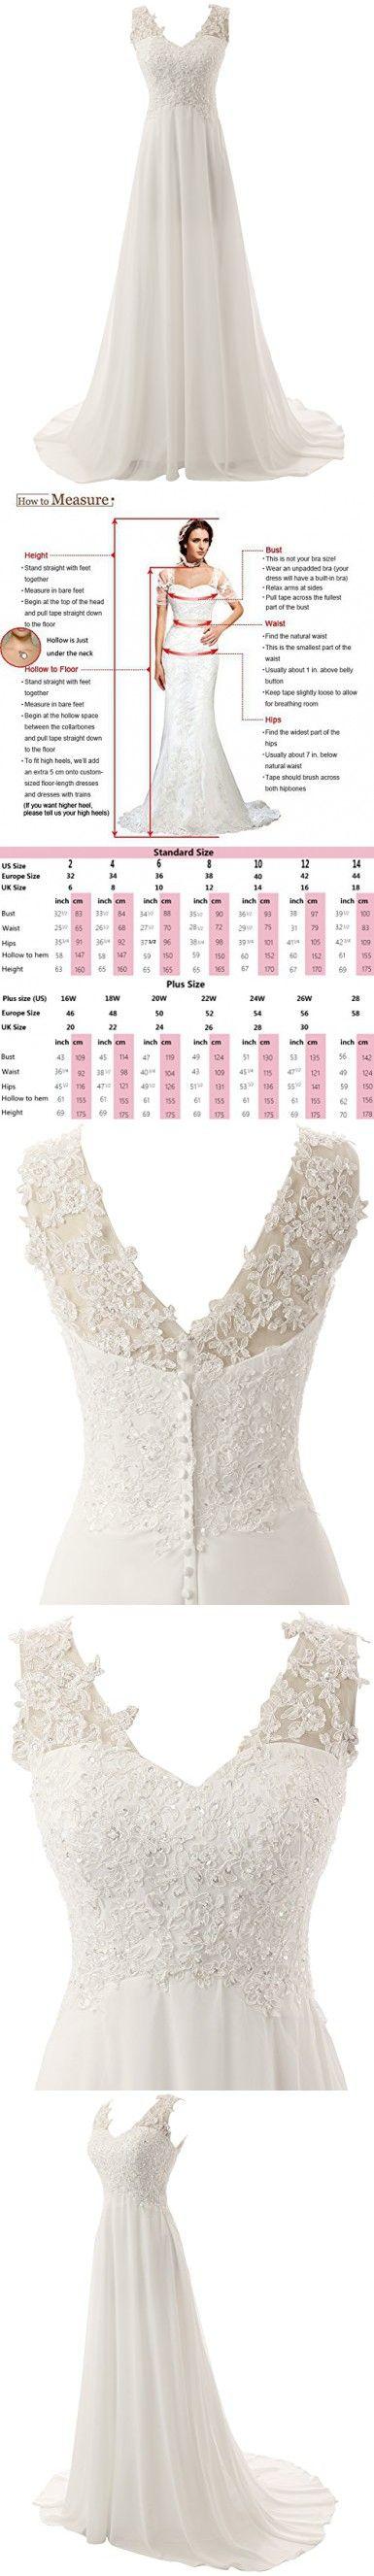 Jaeden elegant lace beach wedding dresses chiffon v neck a line long